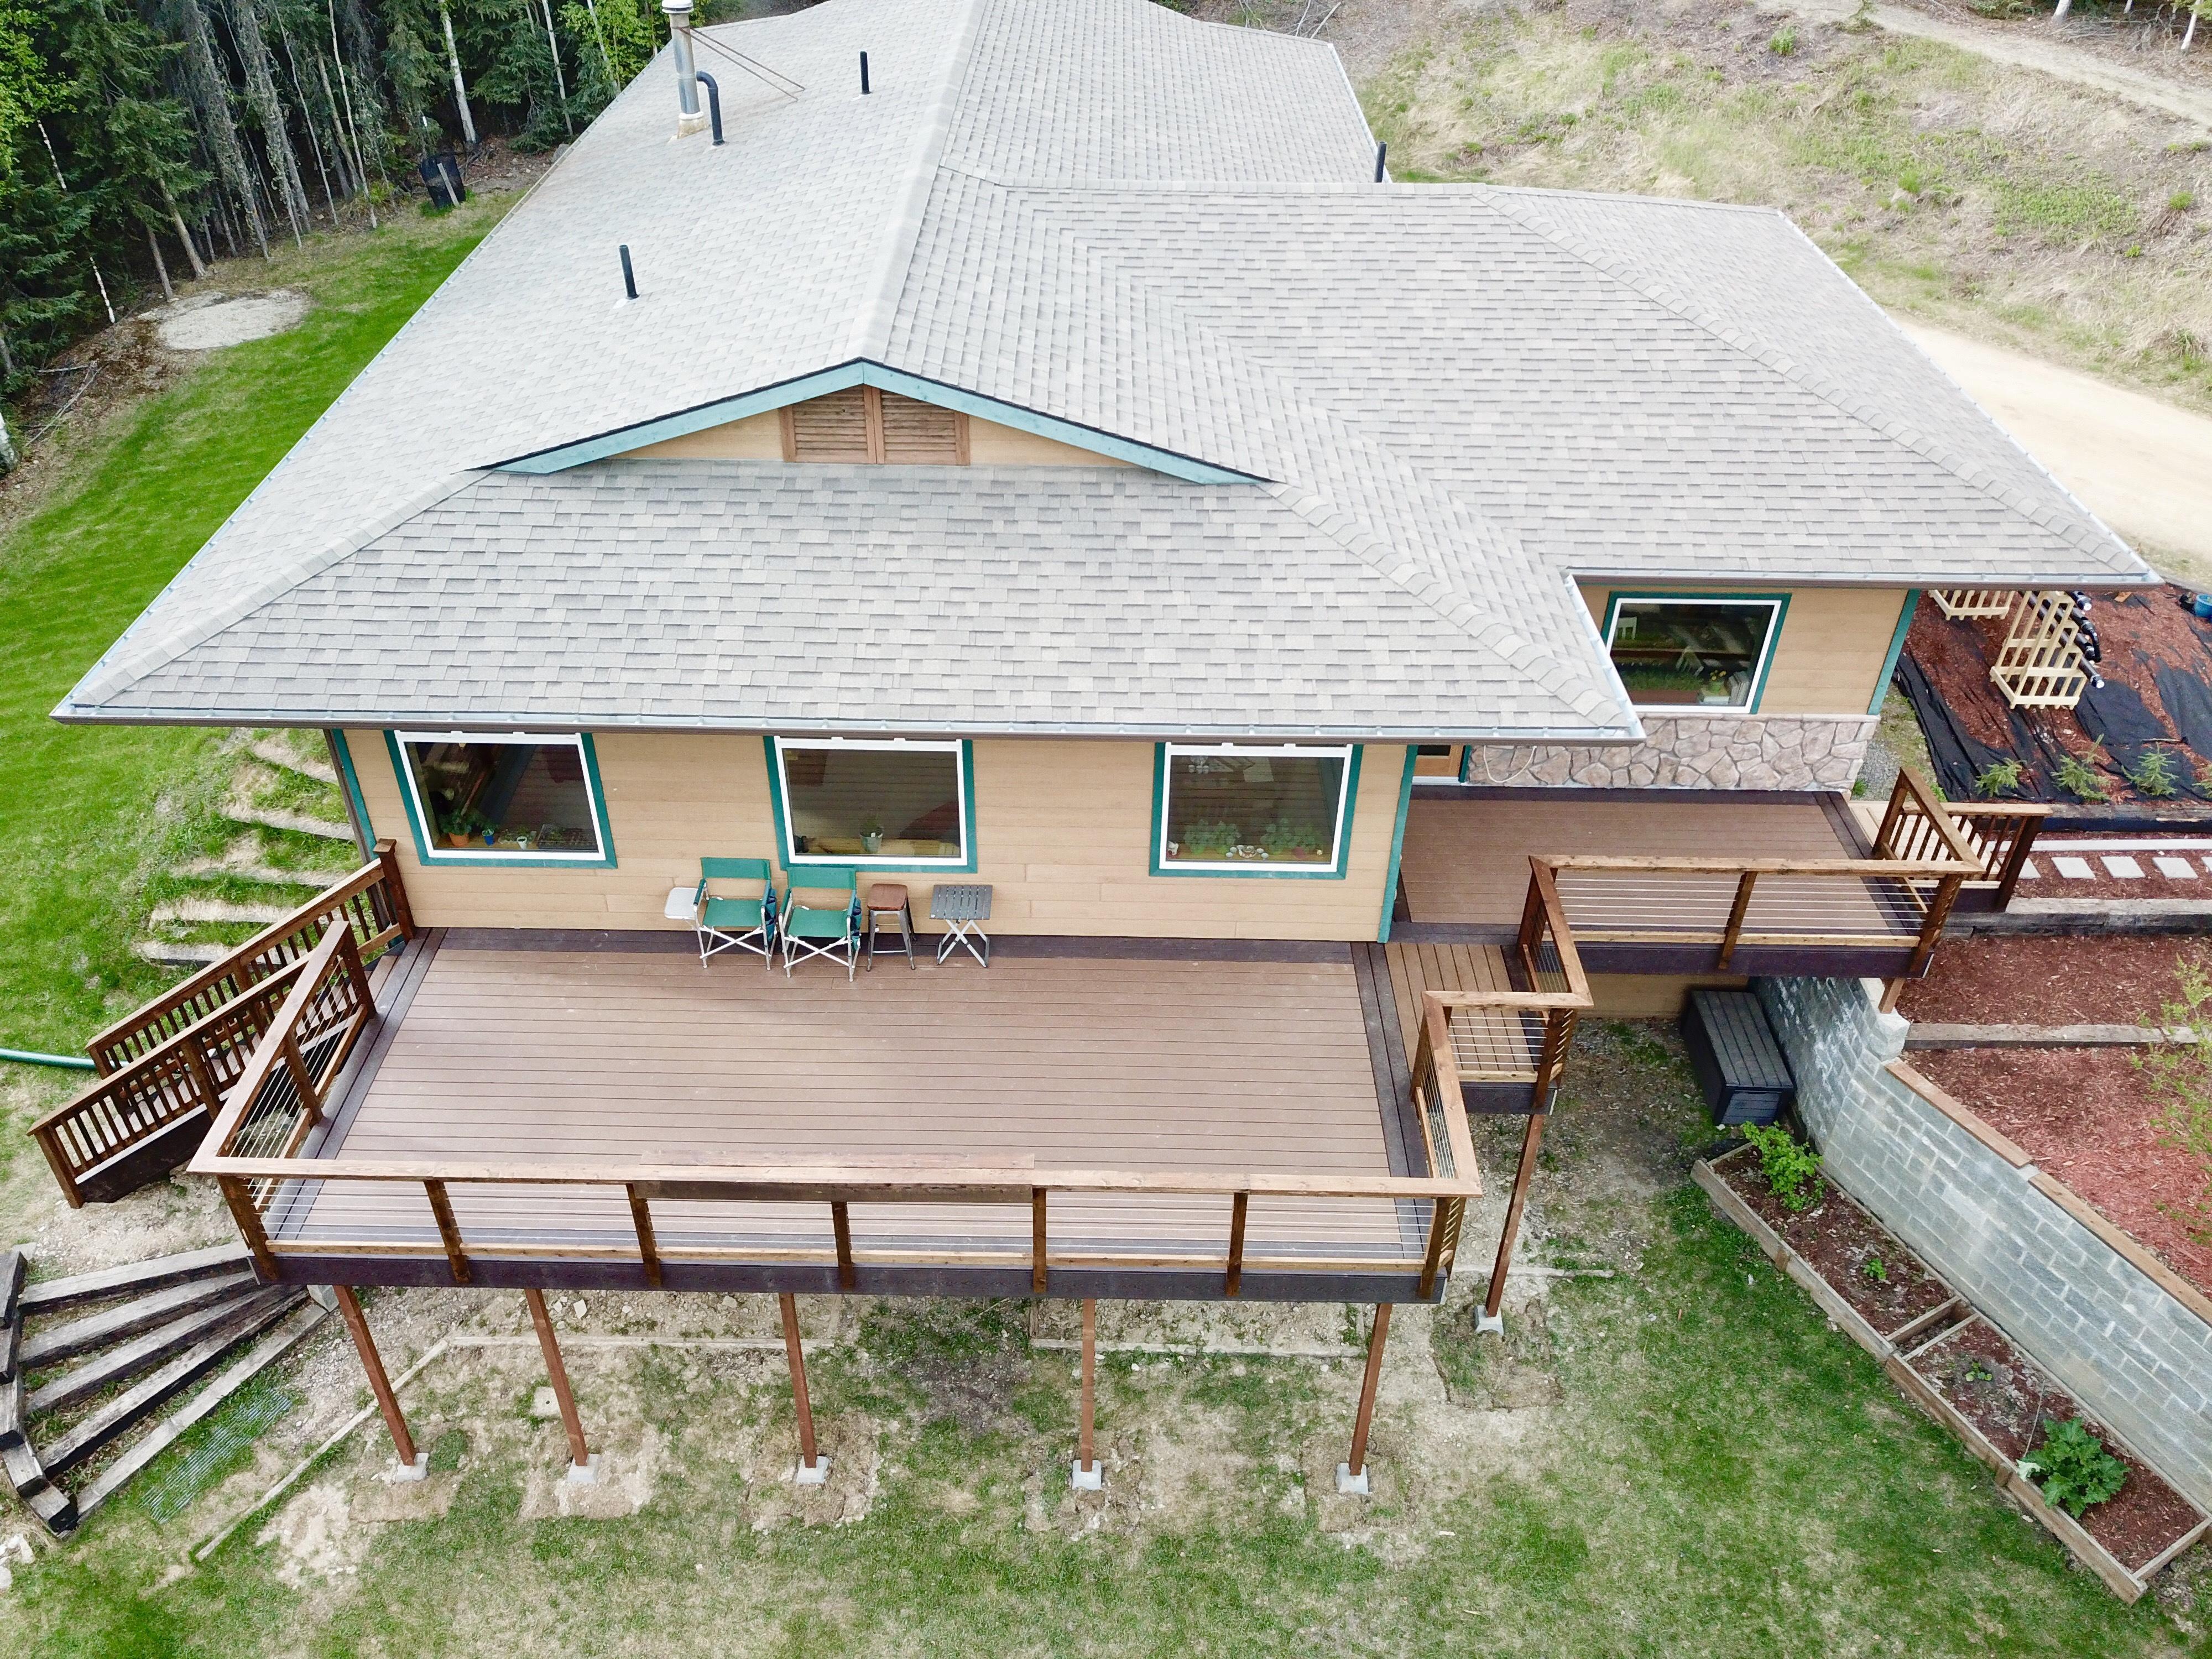 builder-six-star-homes-fairbanks-alaska